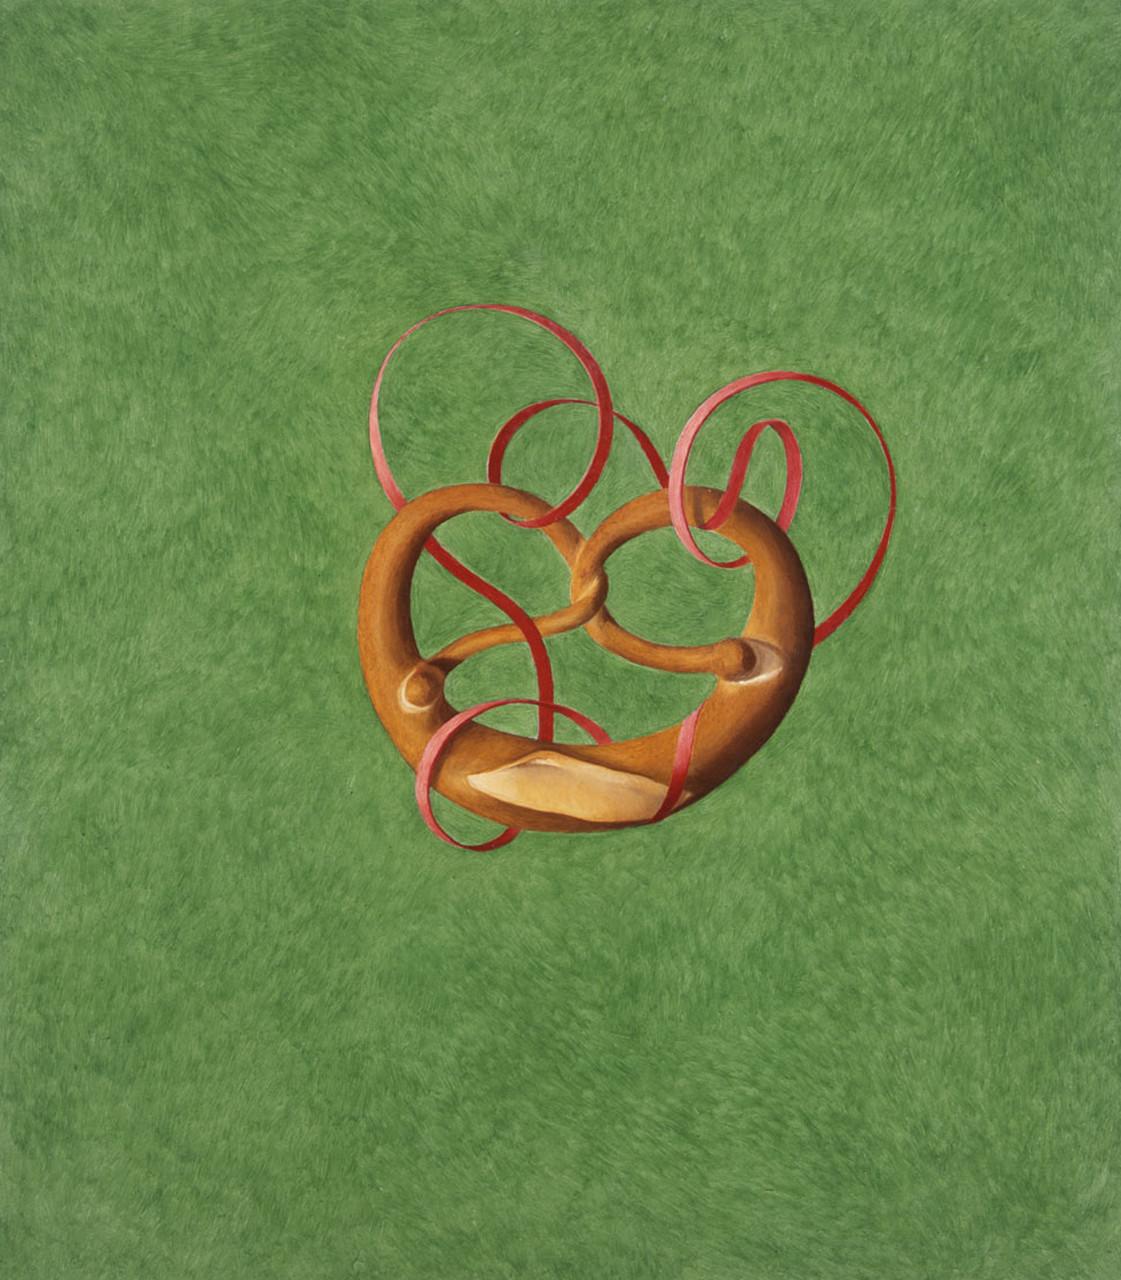 "<div class=""artwork_caption""><p>Untitled (pretzel), 2004</p></div>"